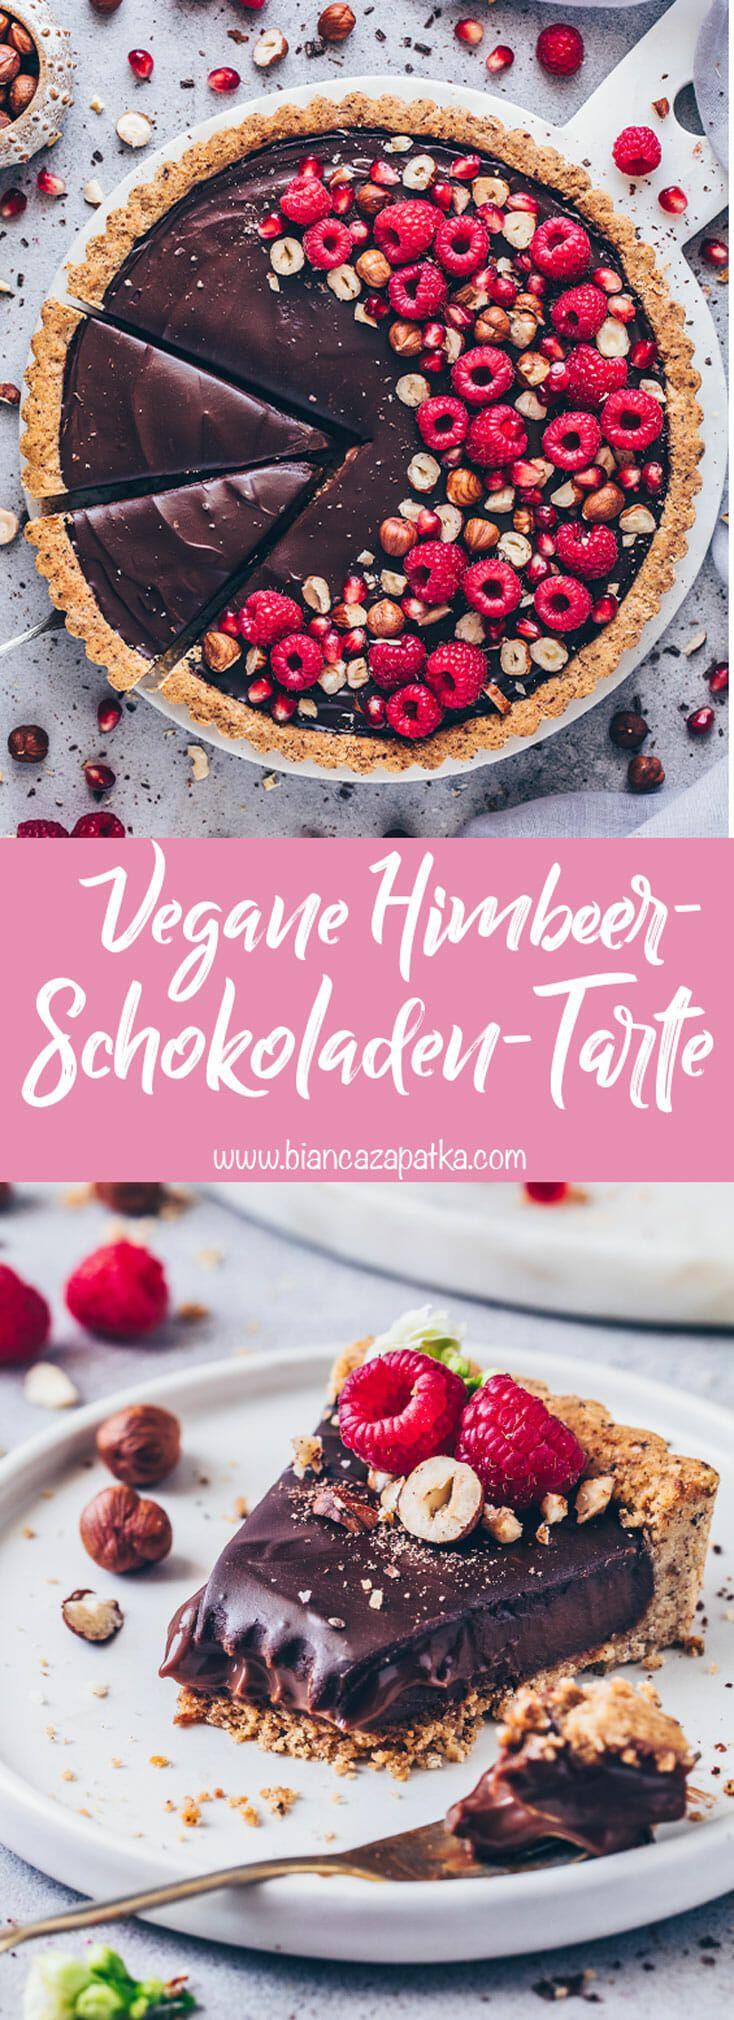 Himbeer Schokoladen Tarte mit Haselnüssen (vegan) - Bianca Zapatka   Rezepte